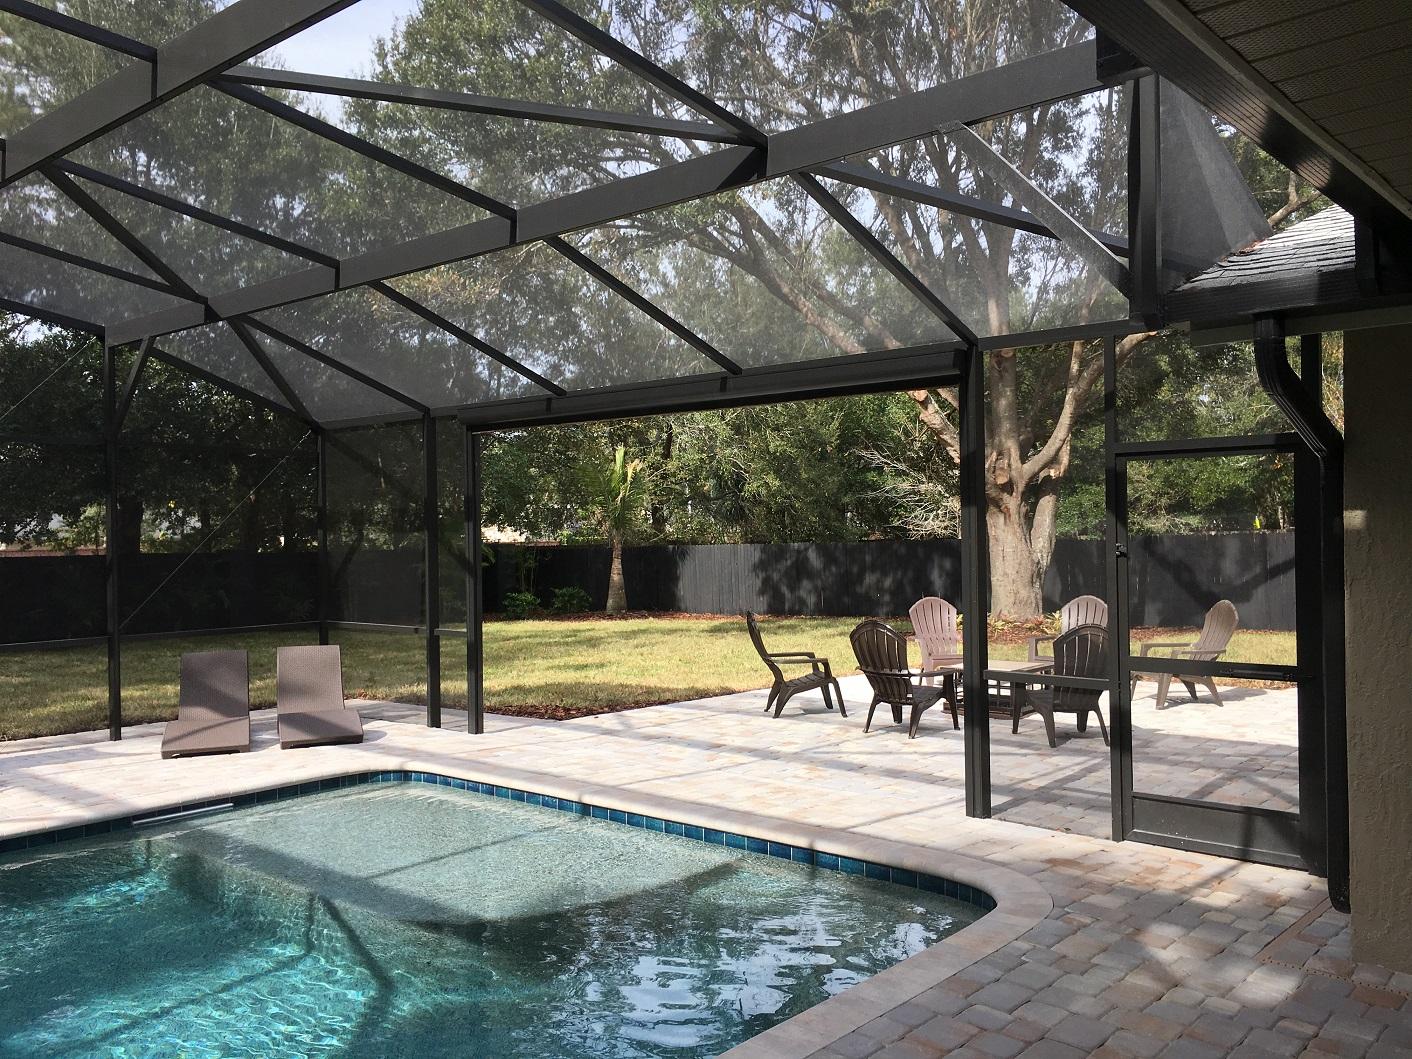 4 Ways to Live the Florida Lifestyle